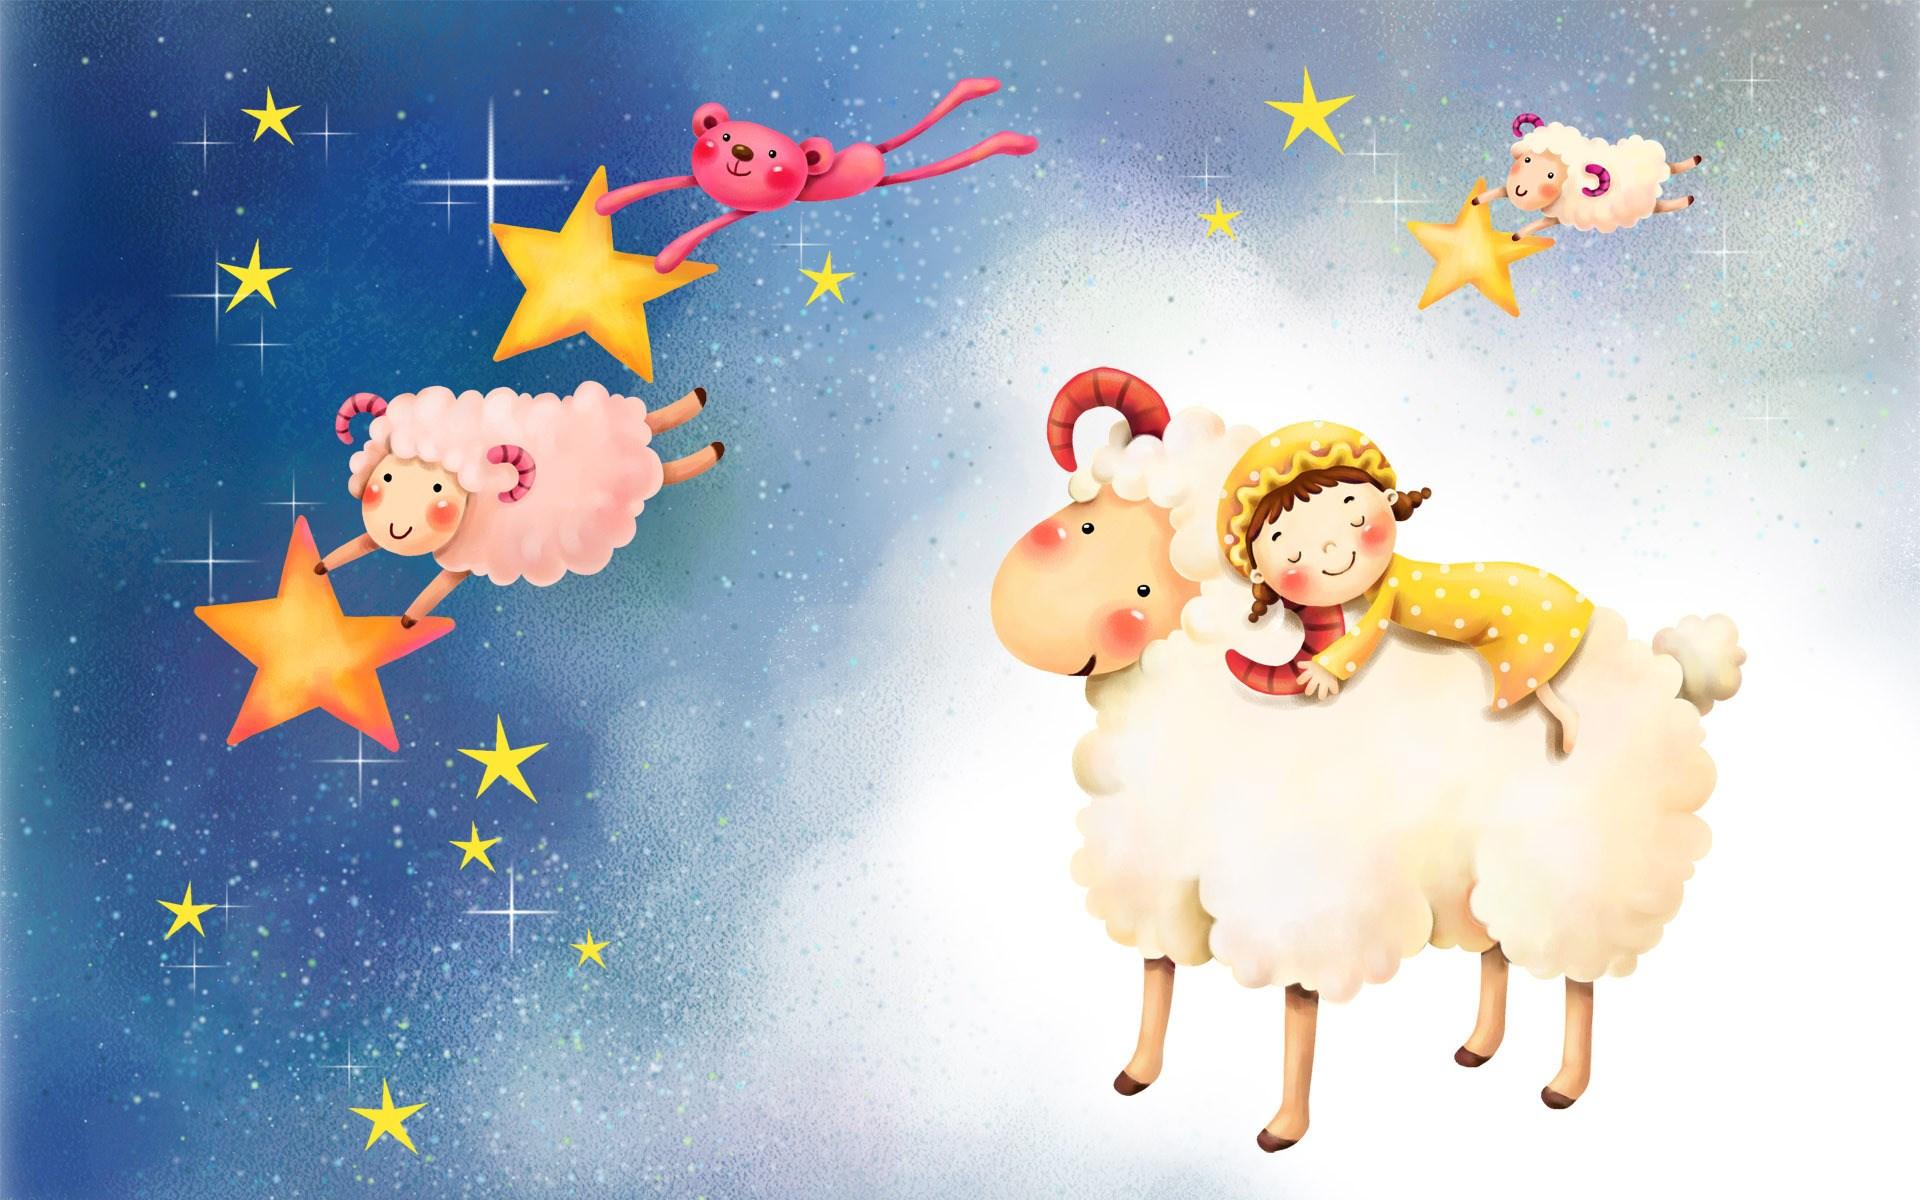 Sheeps Stars Child Sleep Night Art